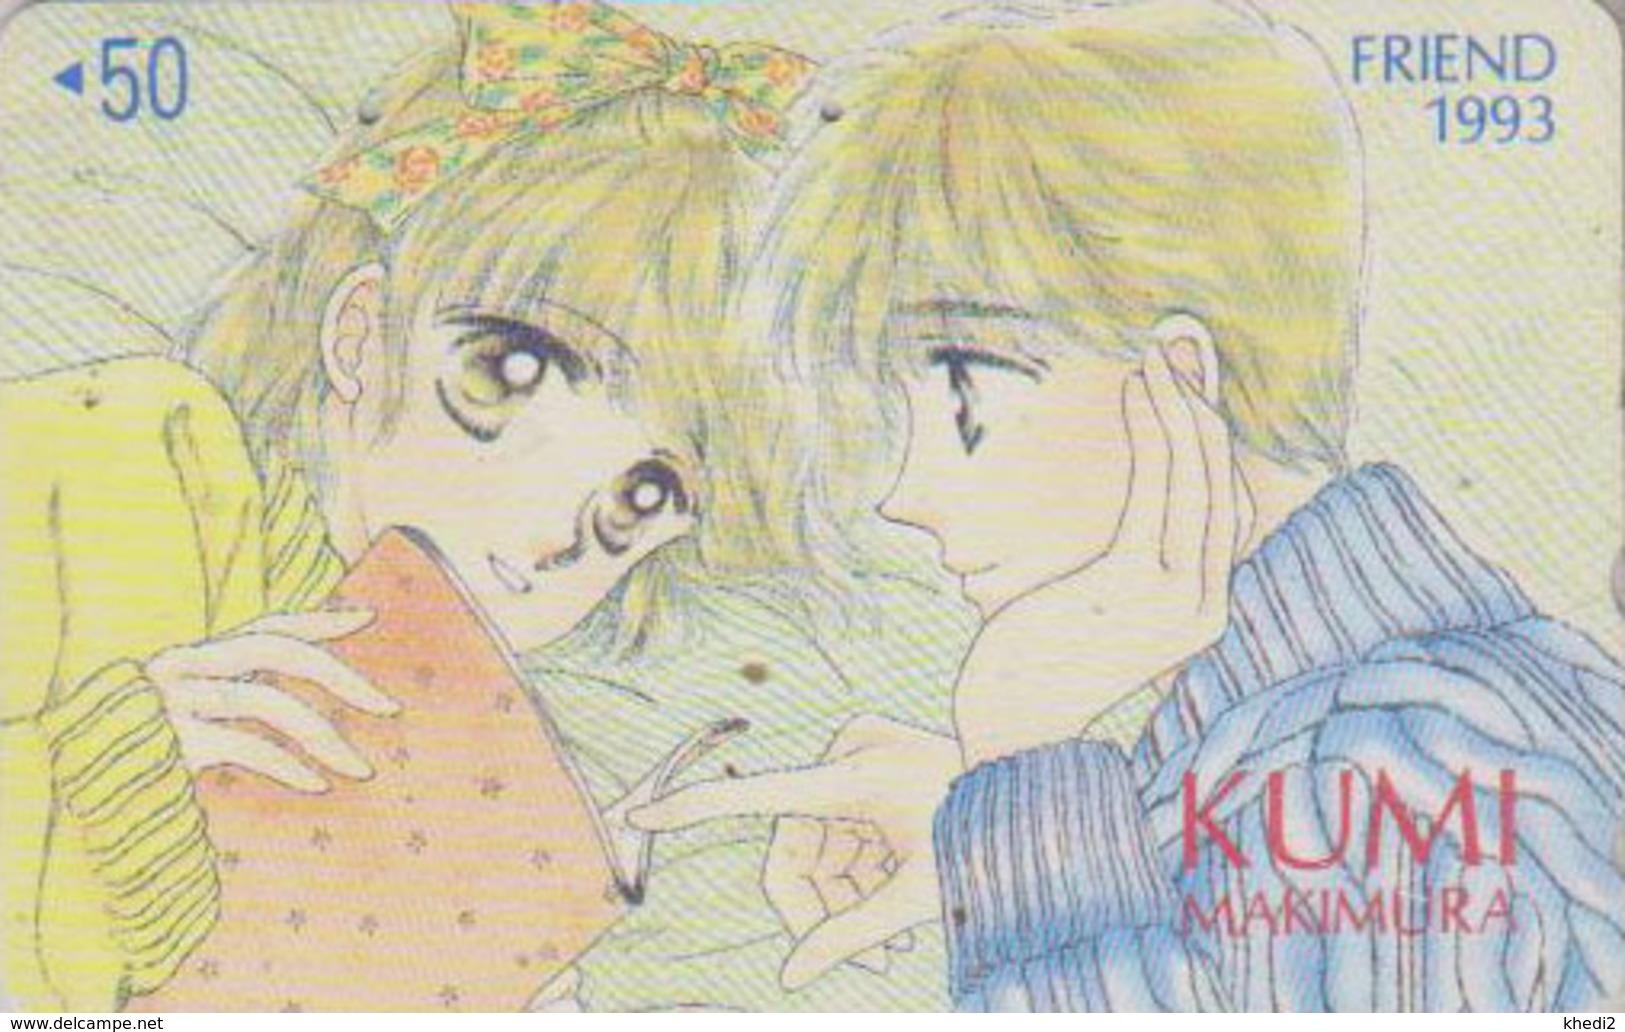 Télécarte Japon / 110-011 - MANGA - FRIEND By KUMI MAKIMURA * 1993 * - ANIME Japan Phonecard - BD COMICS TK - 9656 - BD